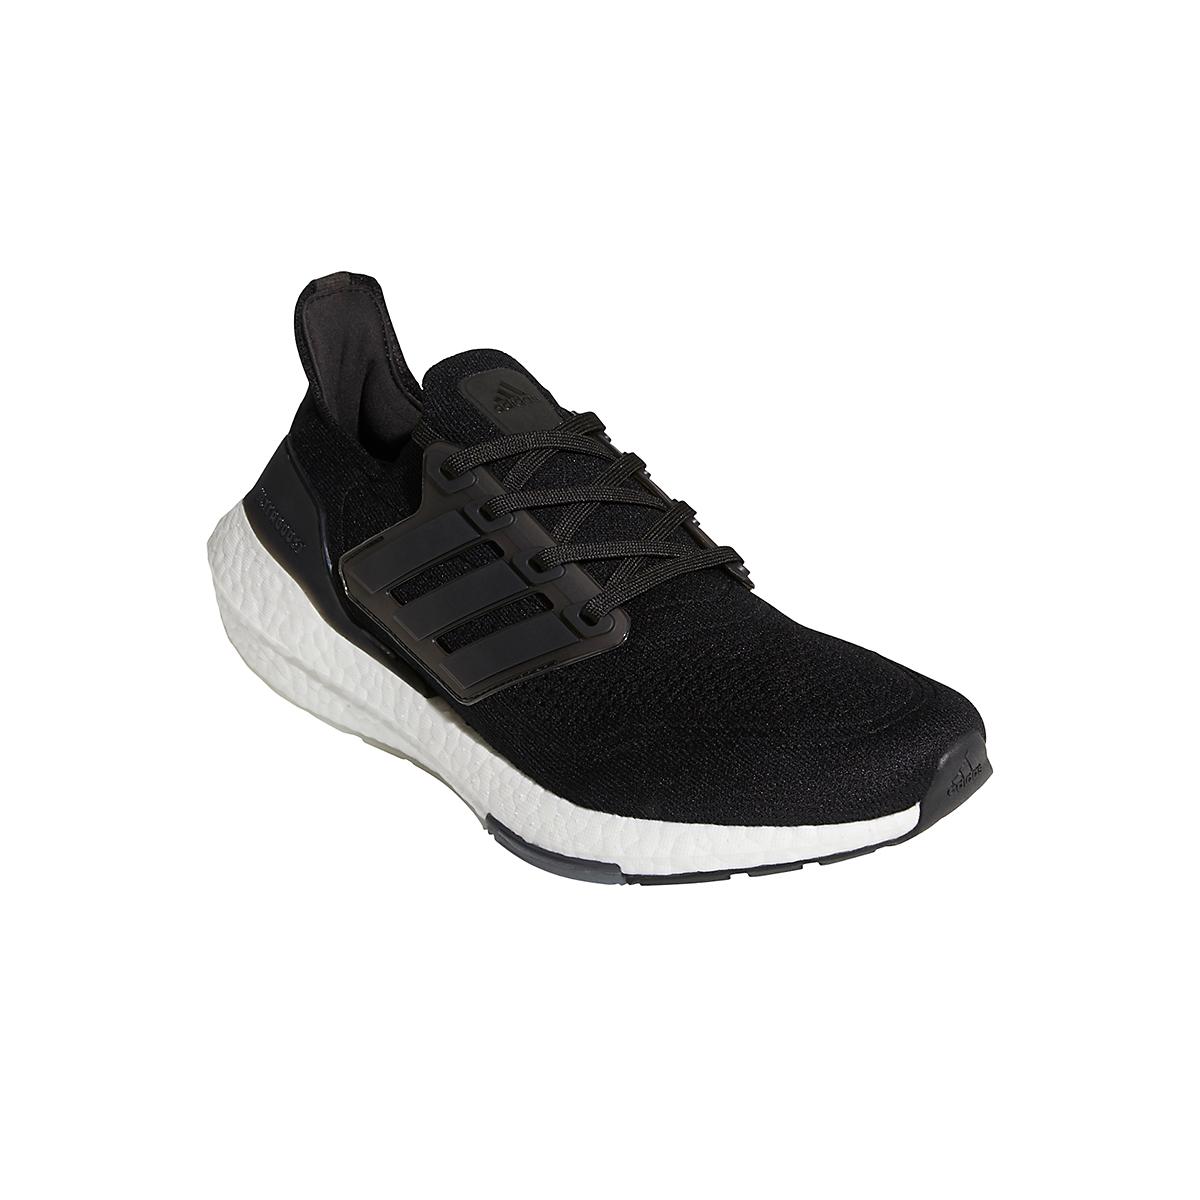 Men's Adidas Ultraboost 21 Running Shoe - Color: Core Black/Grey - Size: 6 - Width: Regular, Core Black/Grey, large, image 3